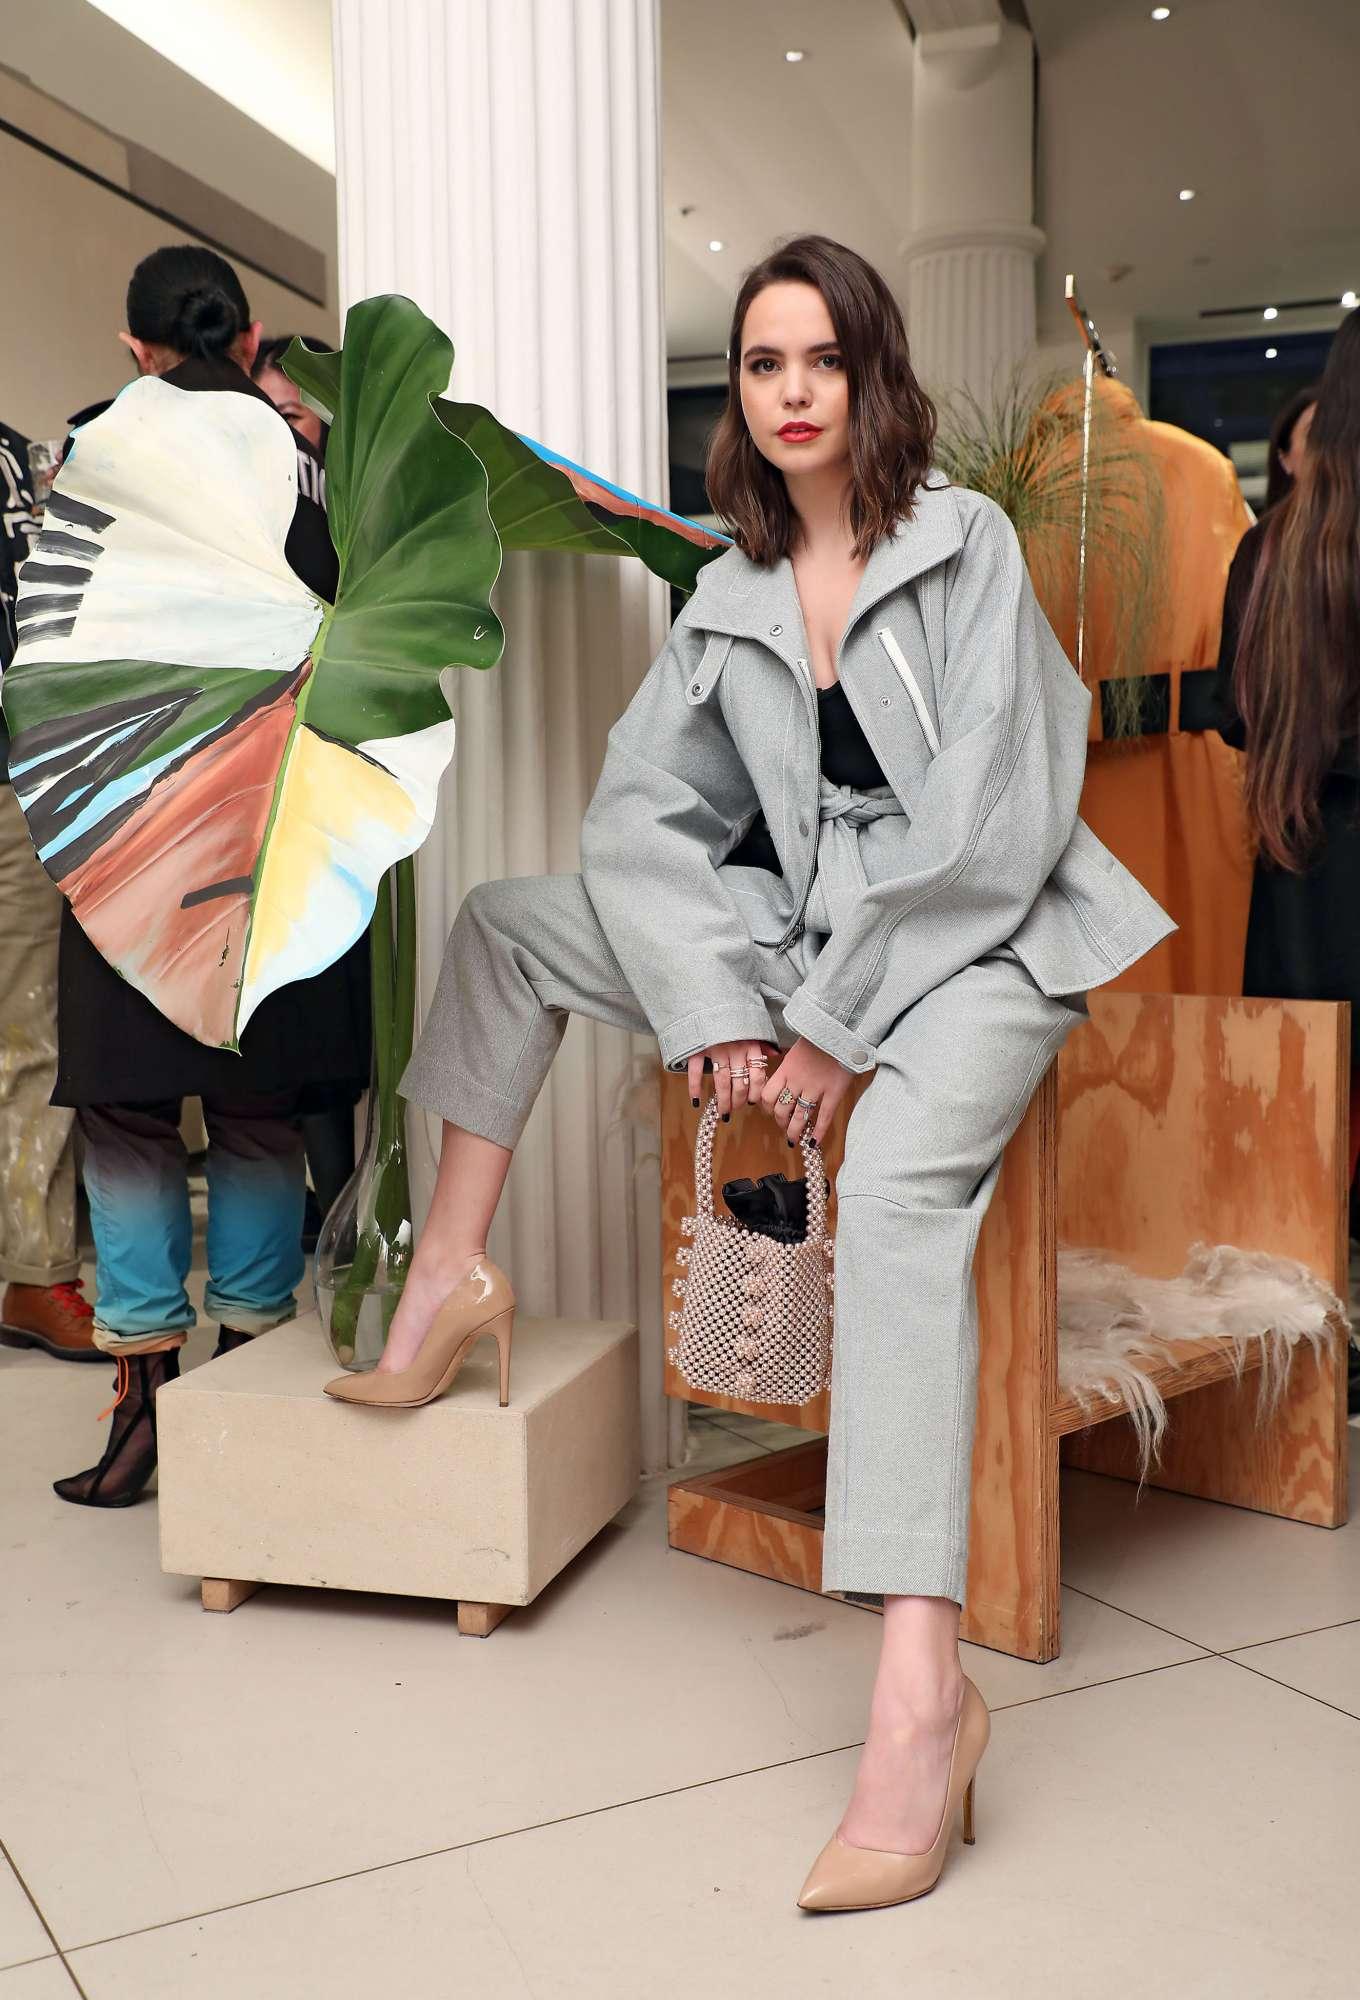 Bailee Madison - 3.1 Phillip Lim Fashion Show 2020 at New York Fashion Week